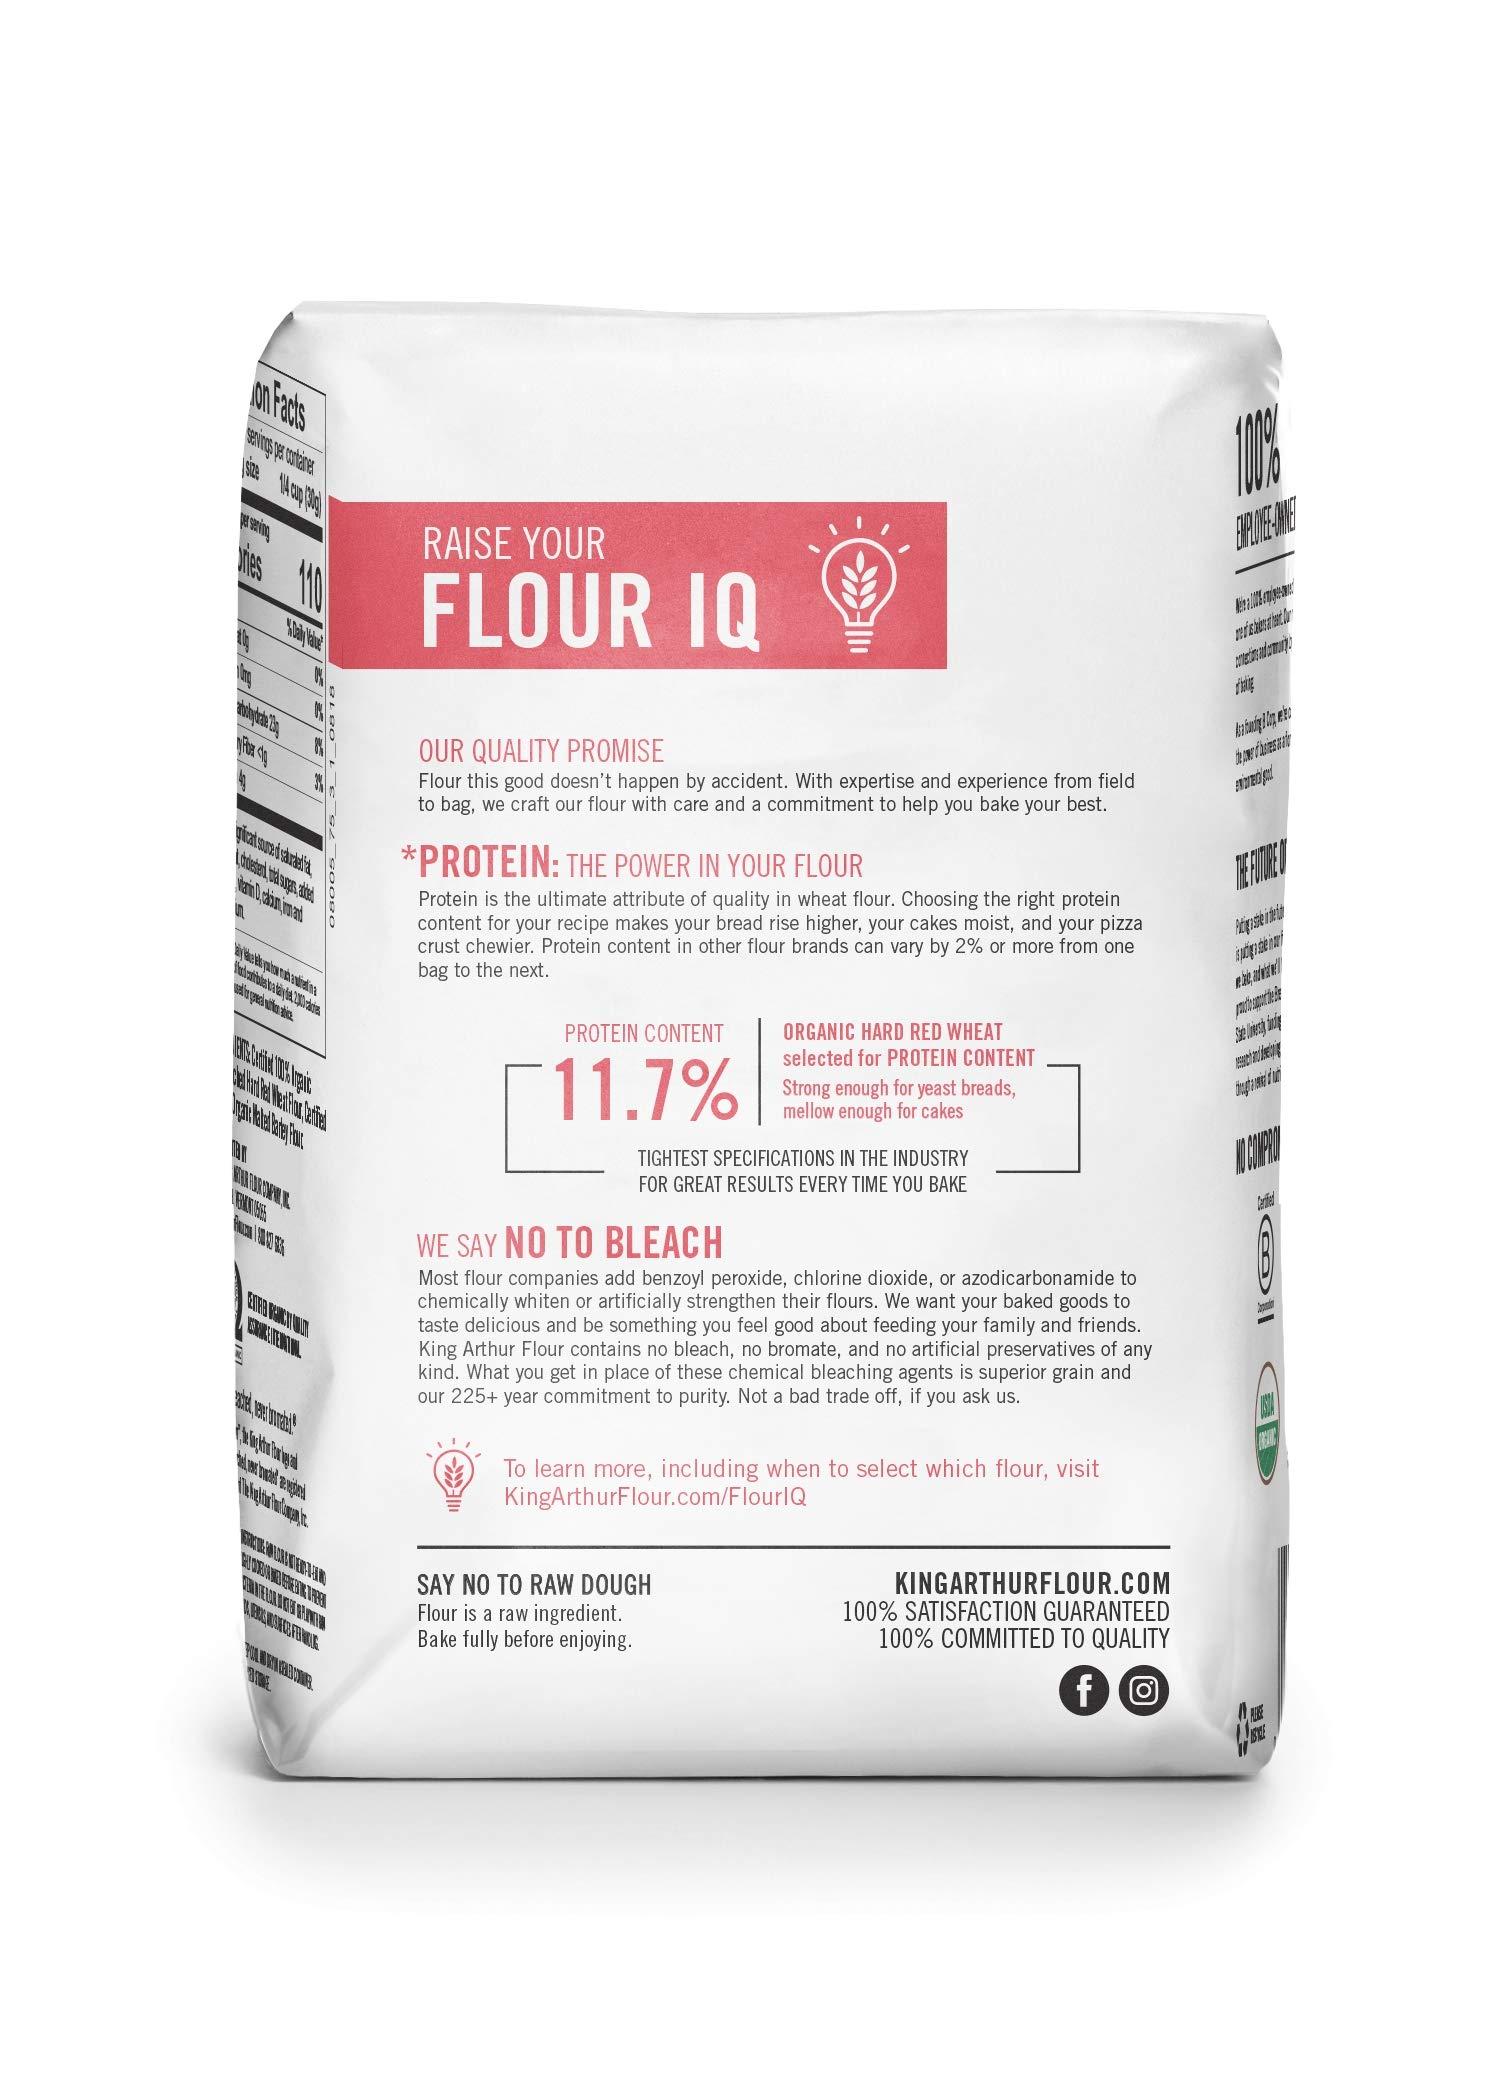 King Arthur Flour 100% Organic All-Purpose Flour, Unbleached, 2 Pound (Pack of 12) by King Arthur Flour (Image #2)